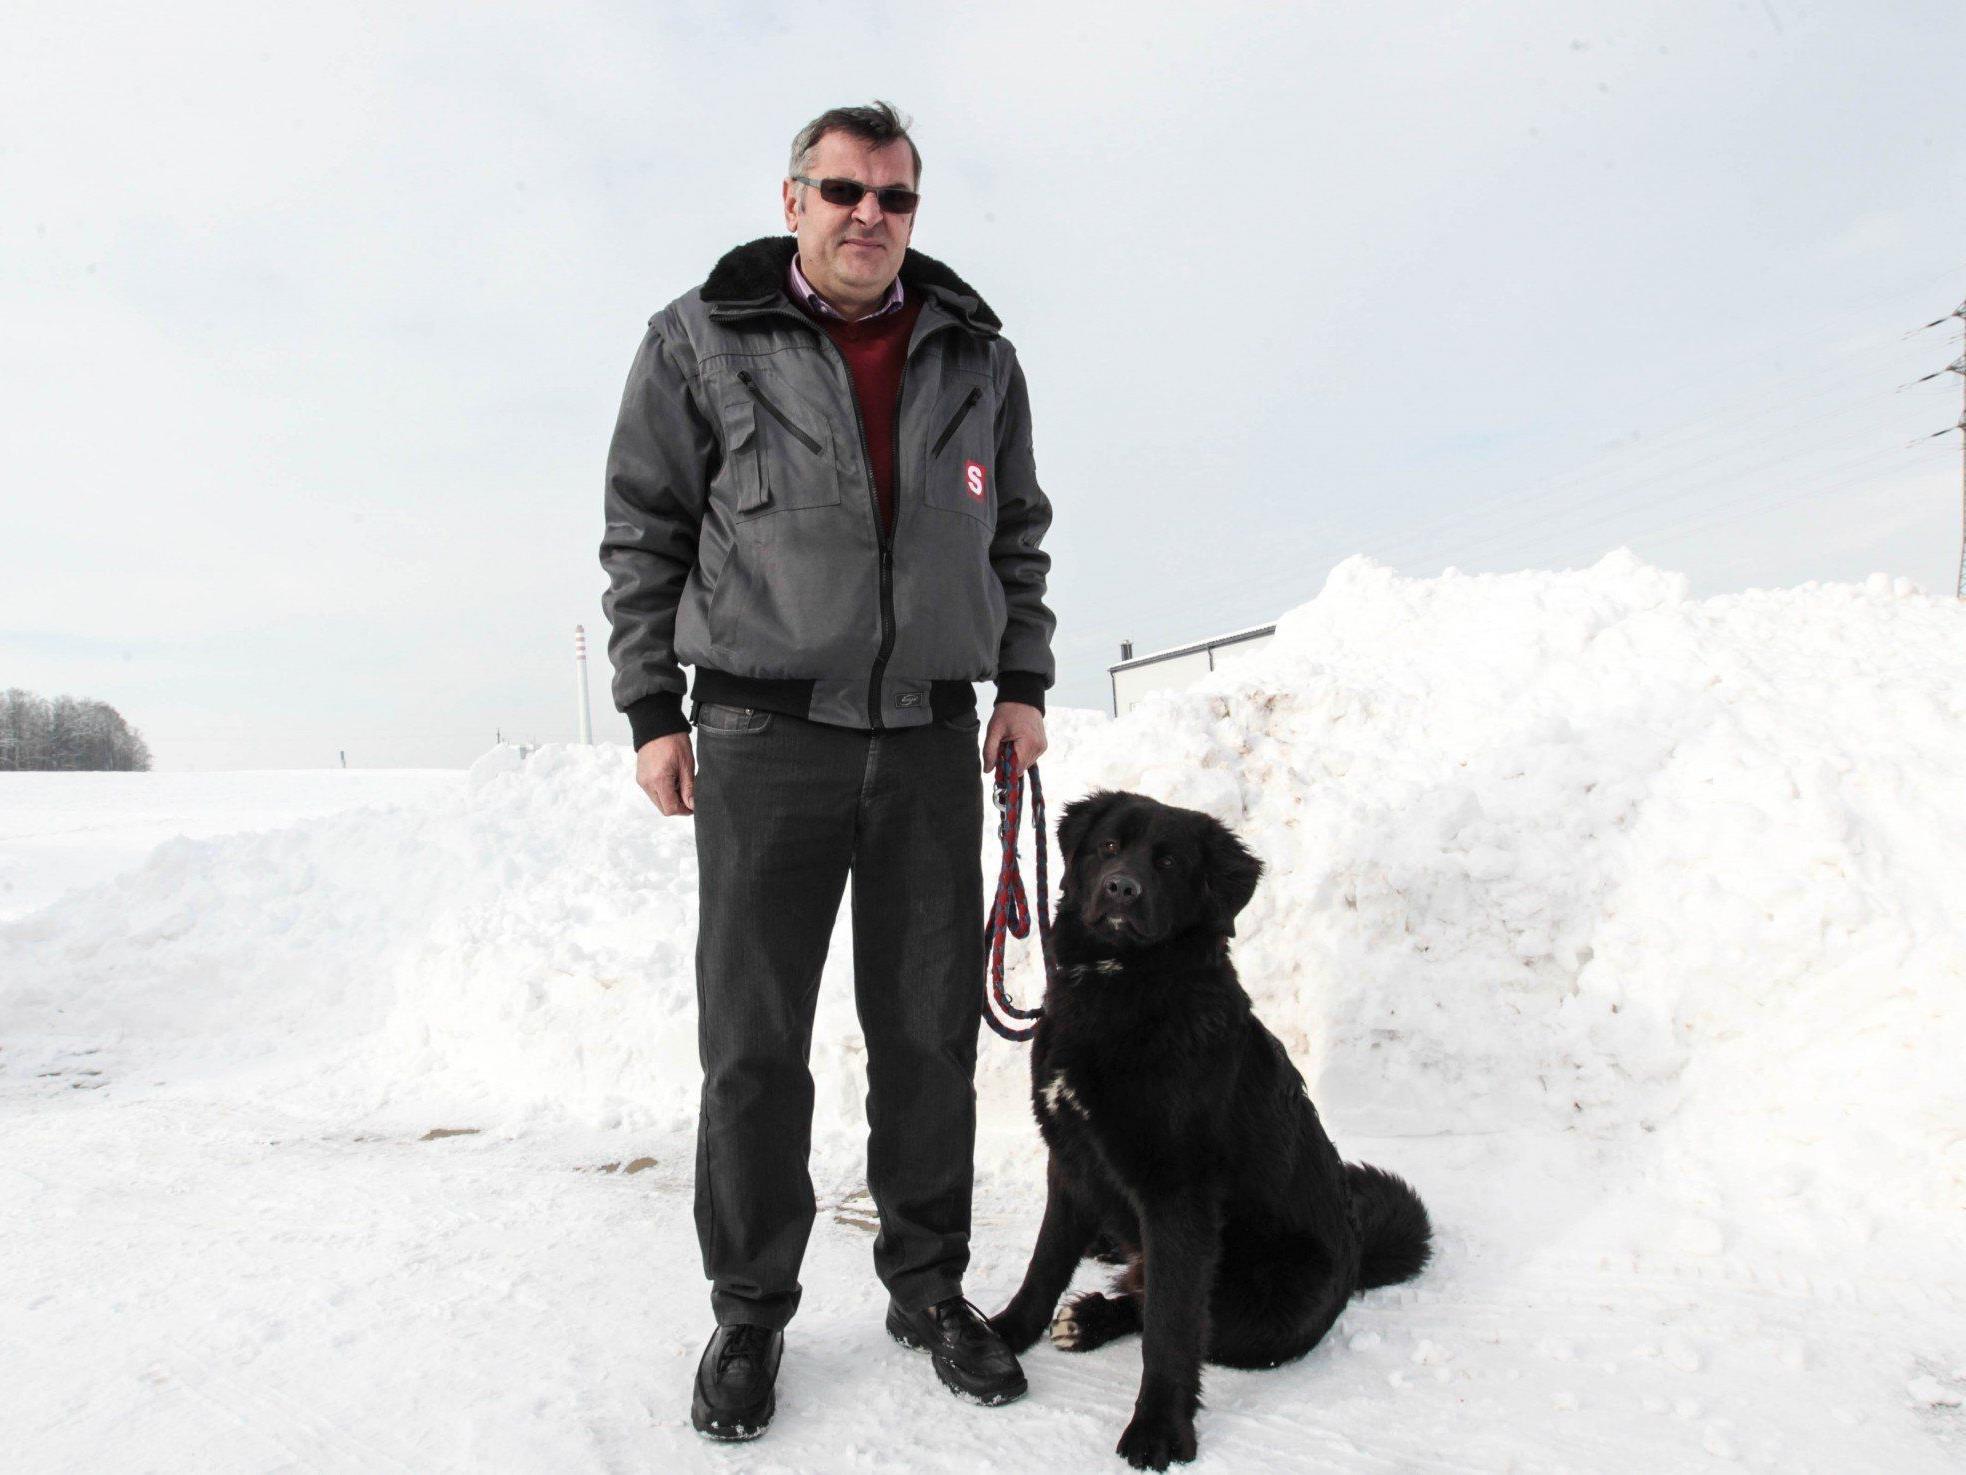 Der 49-jährige Spaziergänger rettete den Betrunkenen vor dem Kältetod.